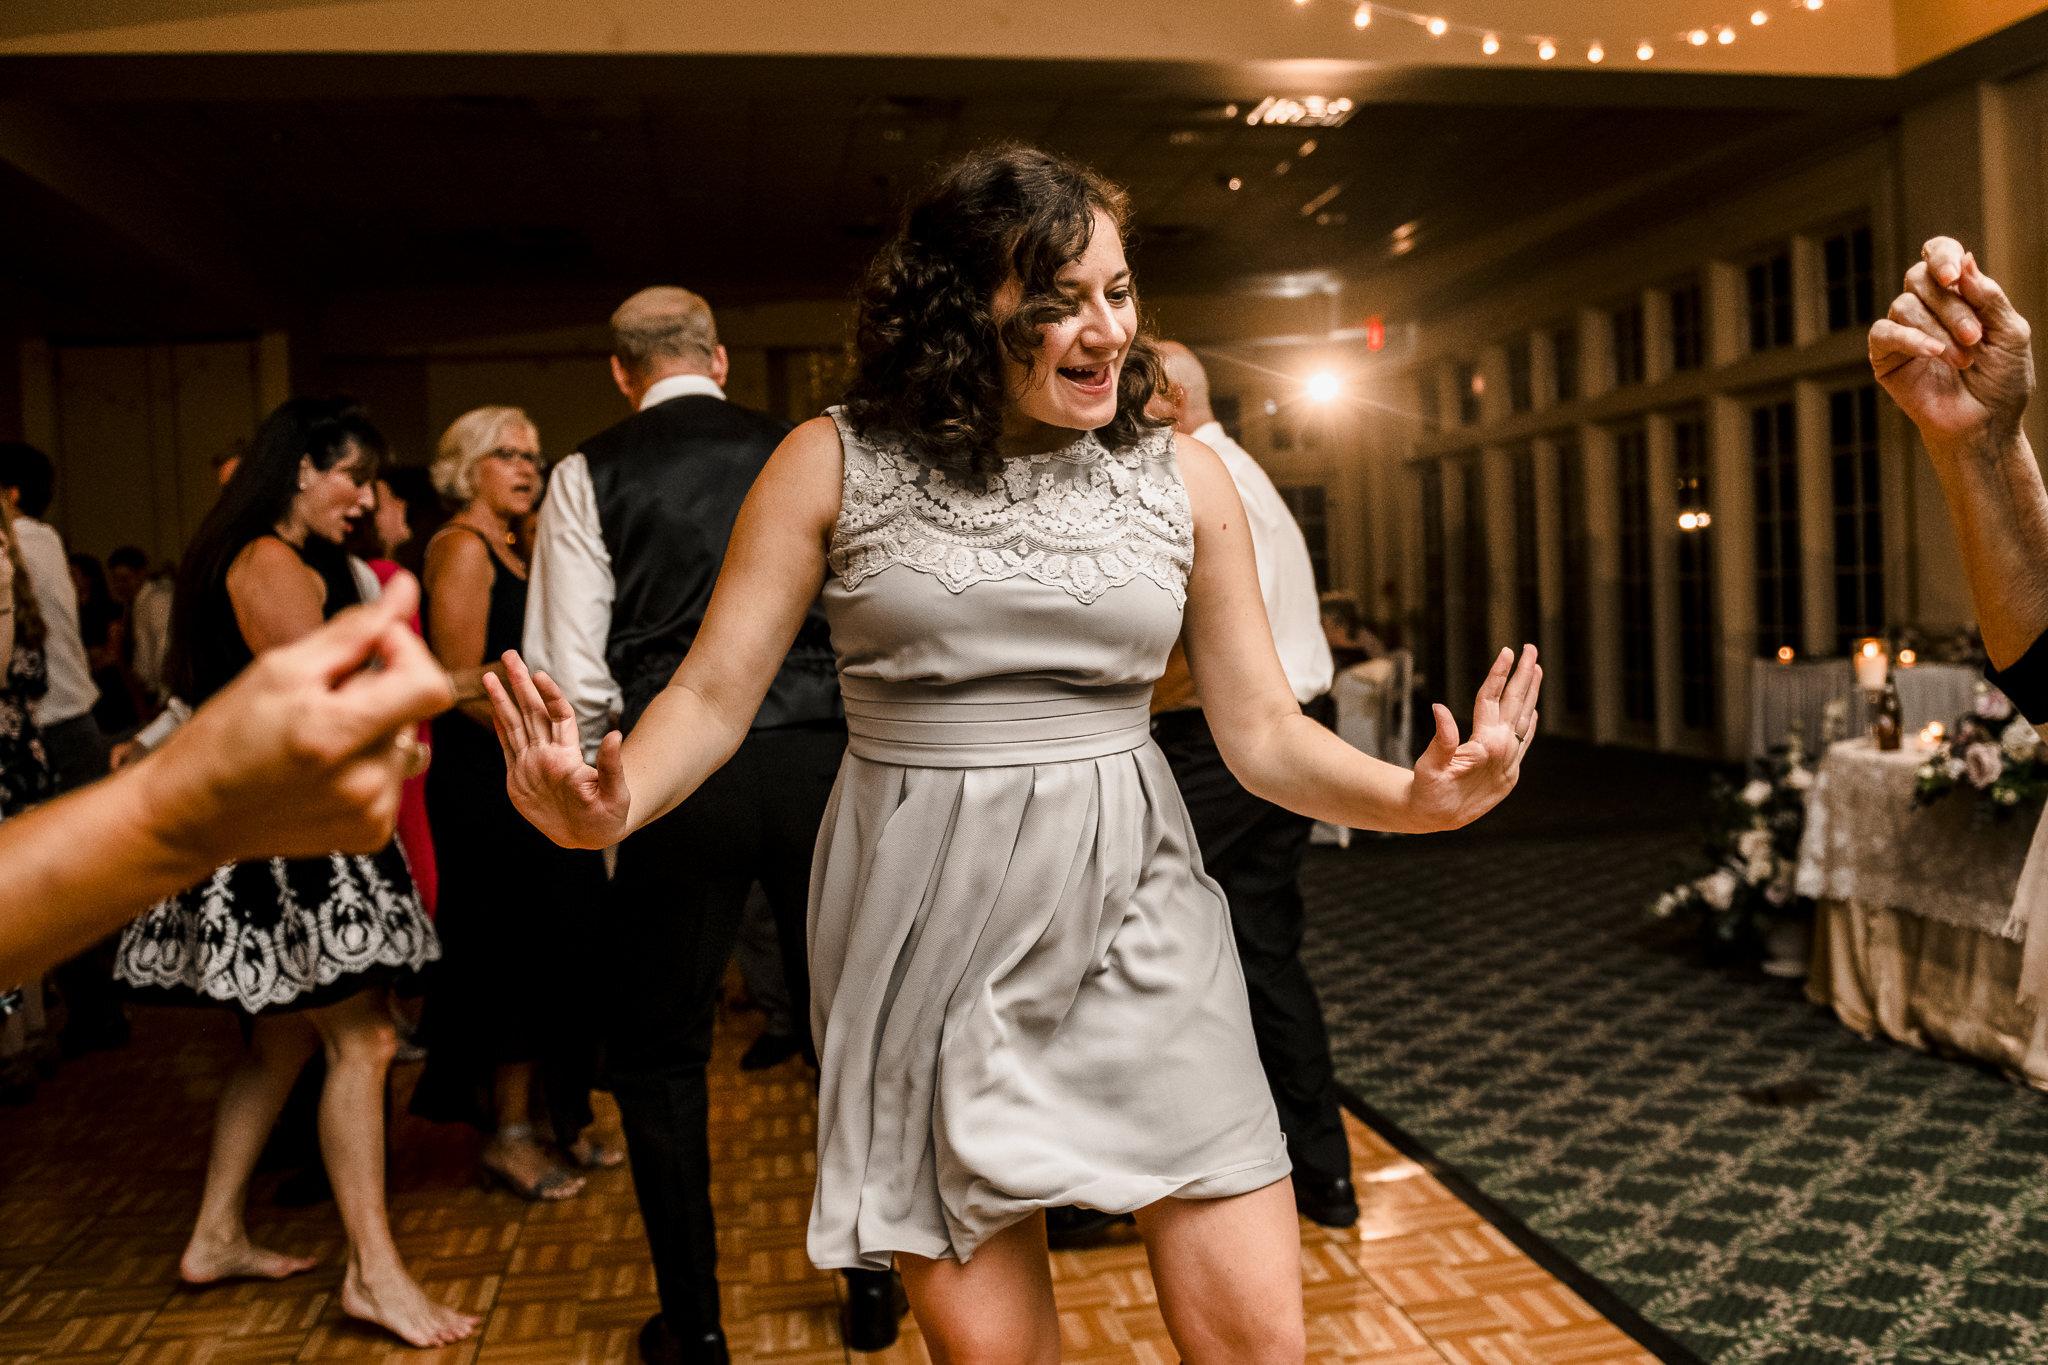 Coyle-Forsgate-Country-Club-Wedding-Photographer-50.JPG